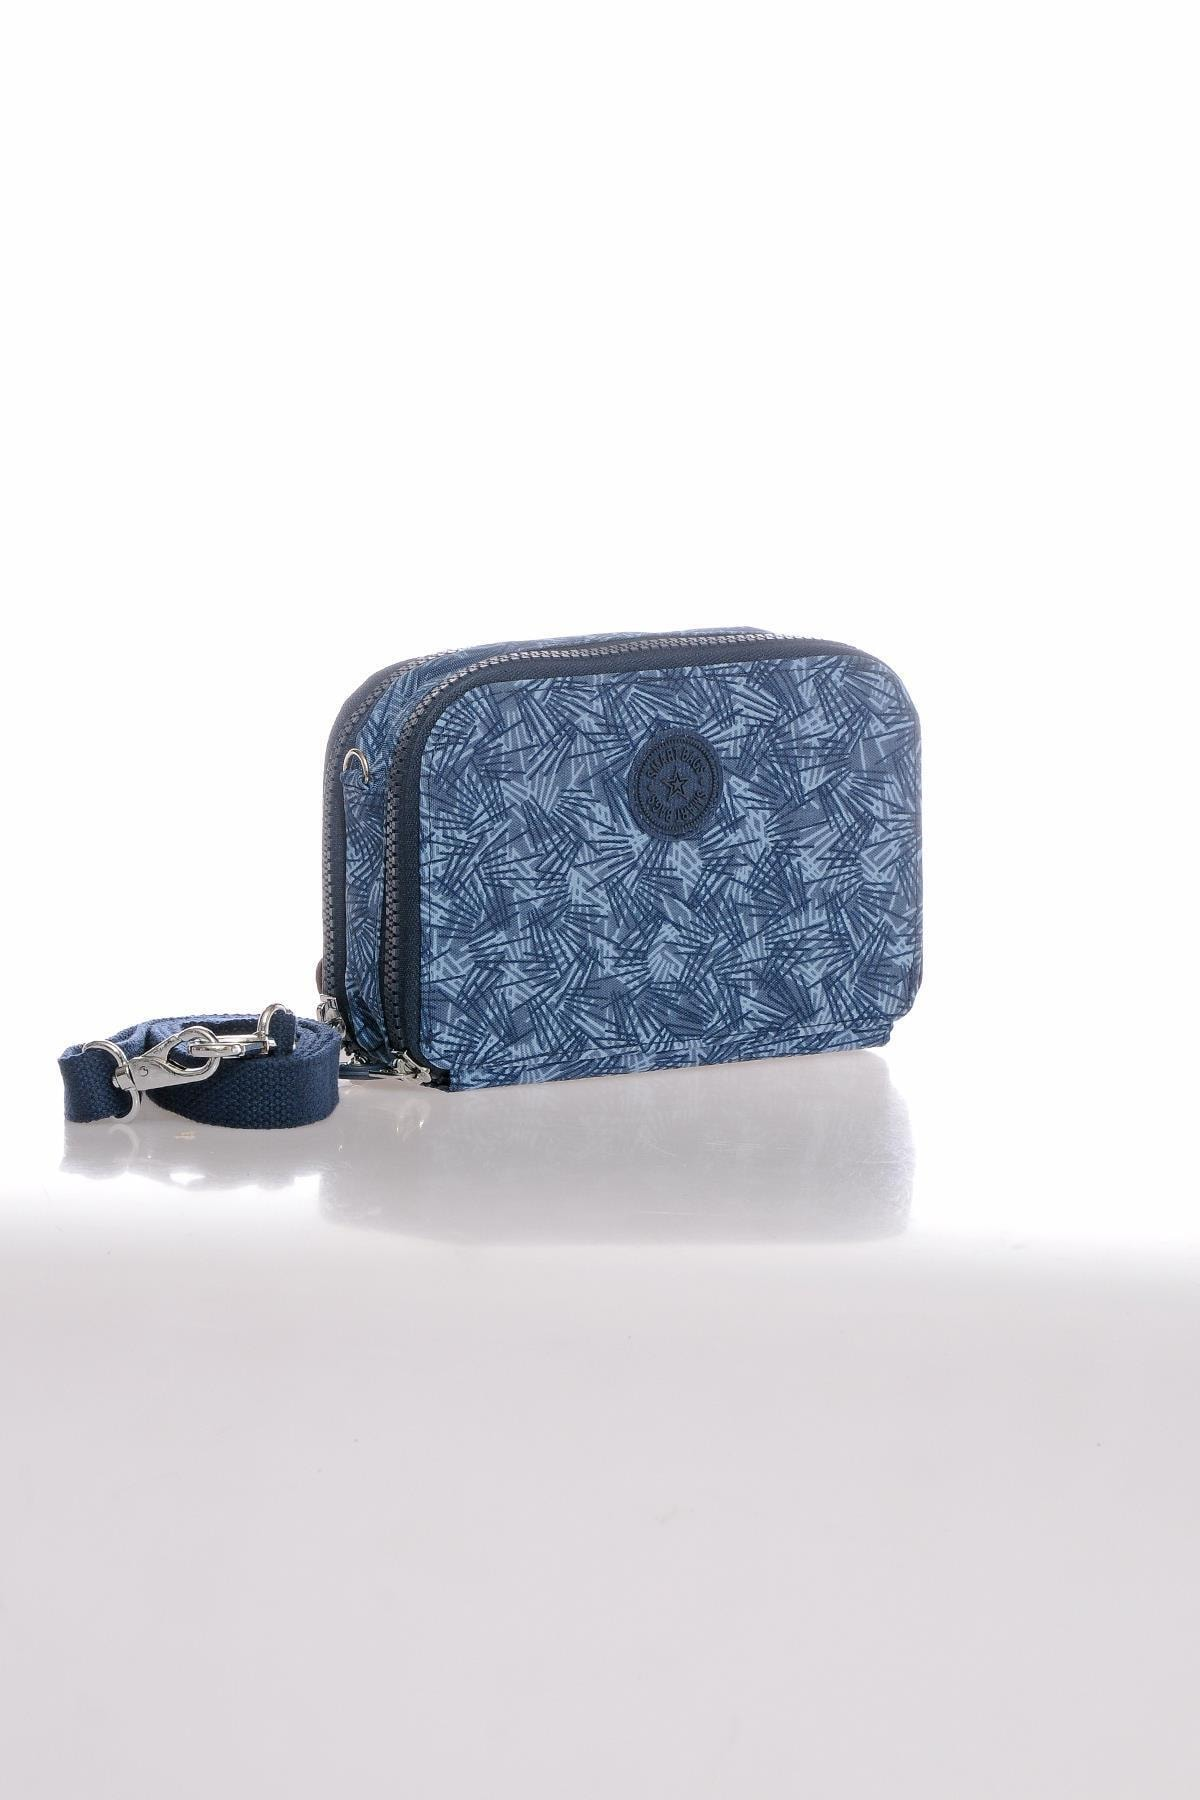 SMART BAGS Kadın Mavi/ Portföy Çanta Smb3038-0097 2